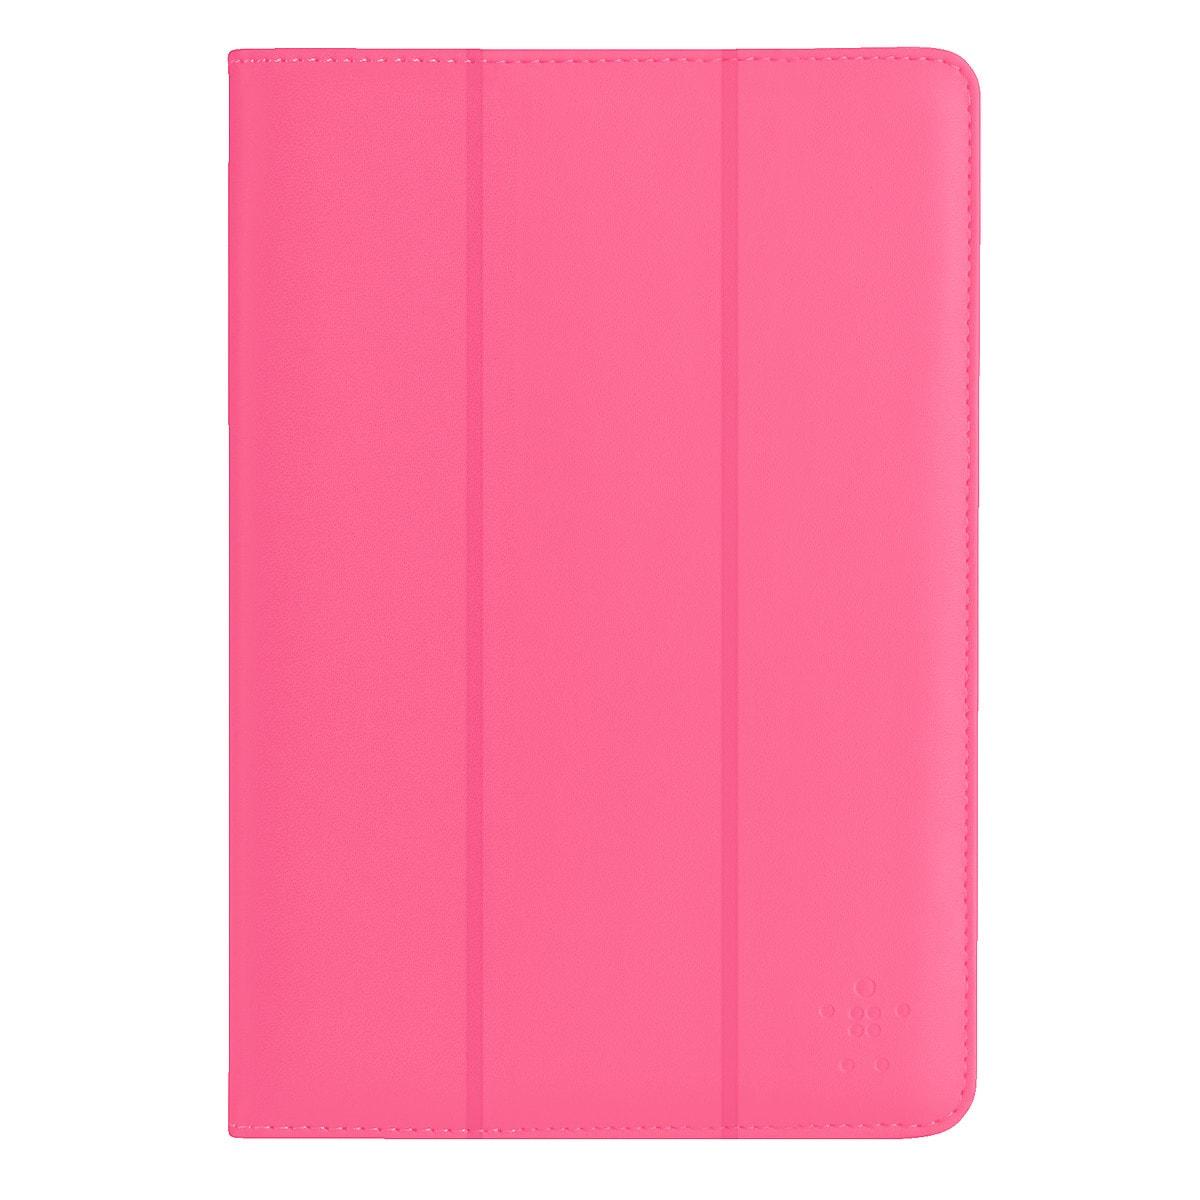 Belkin Tri-Fold futteral for Galaxy Tab 3 10,1